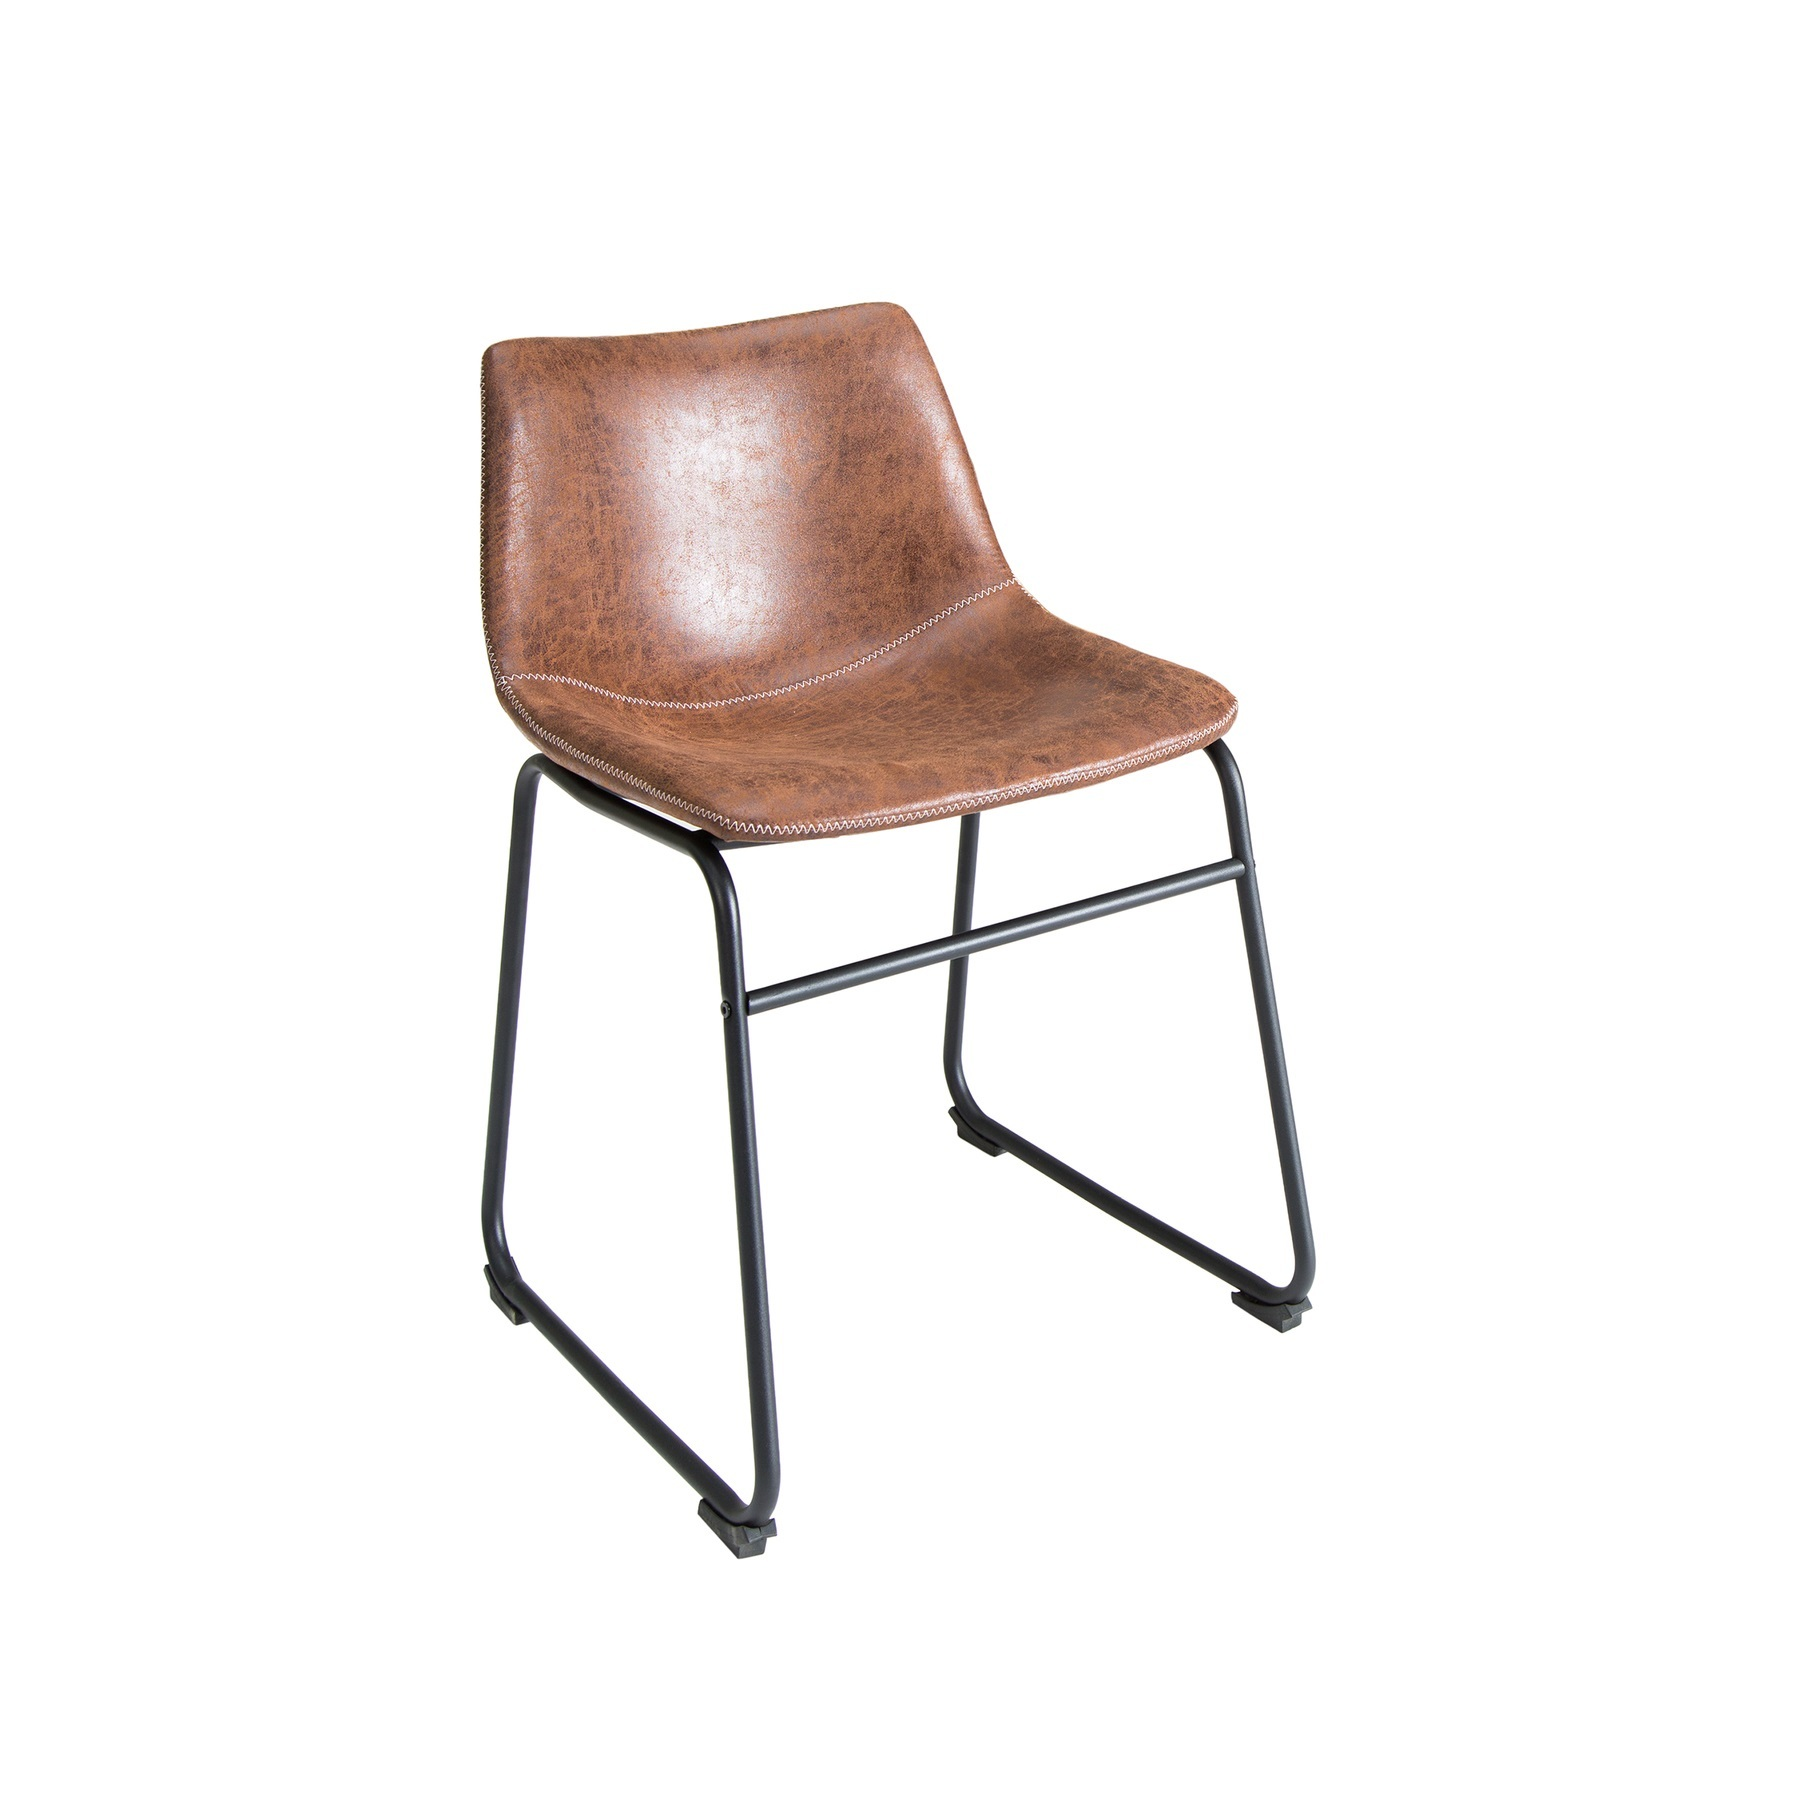 Design stuhl django vintage braun mit eisengestell for Design stuhl vintage